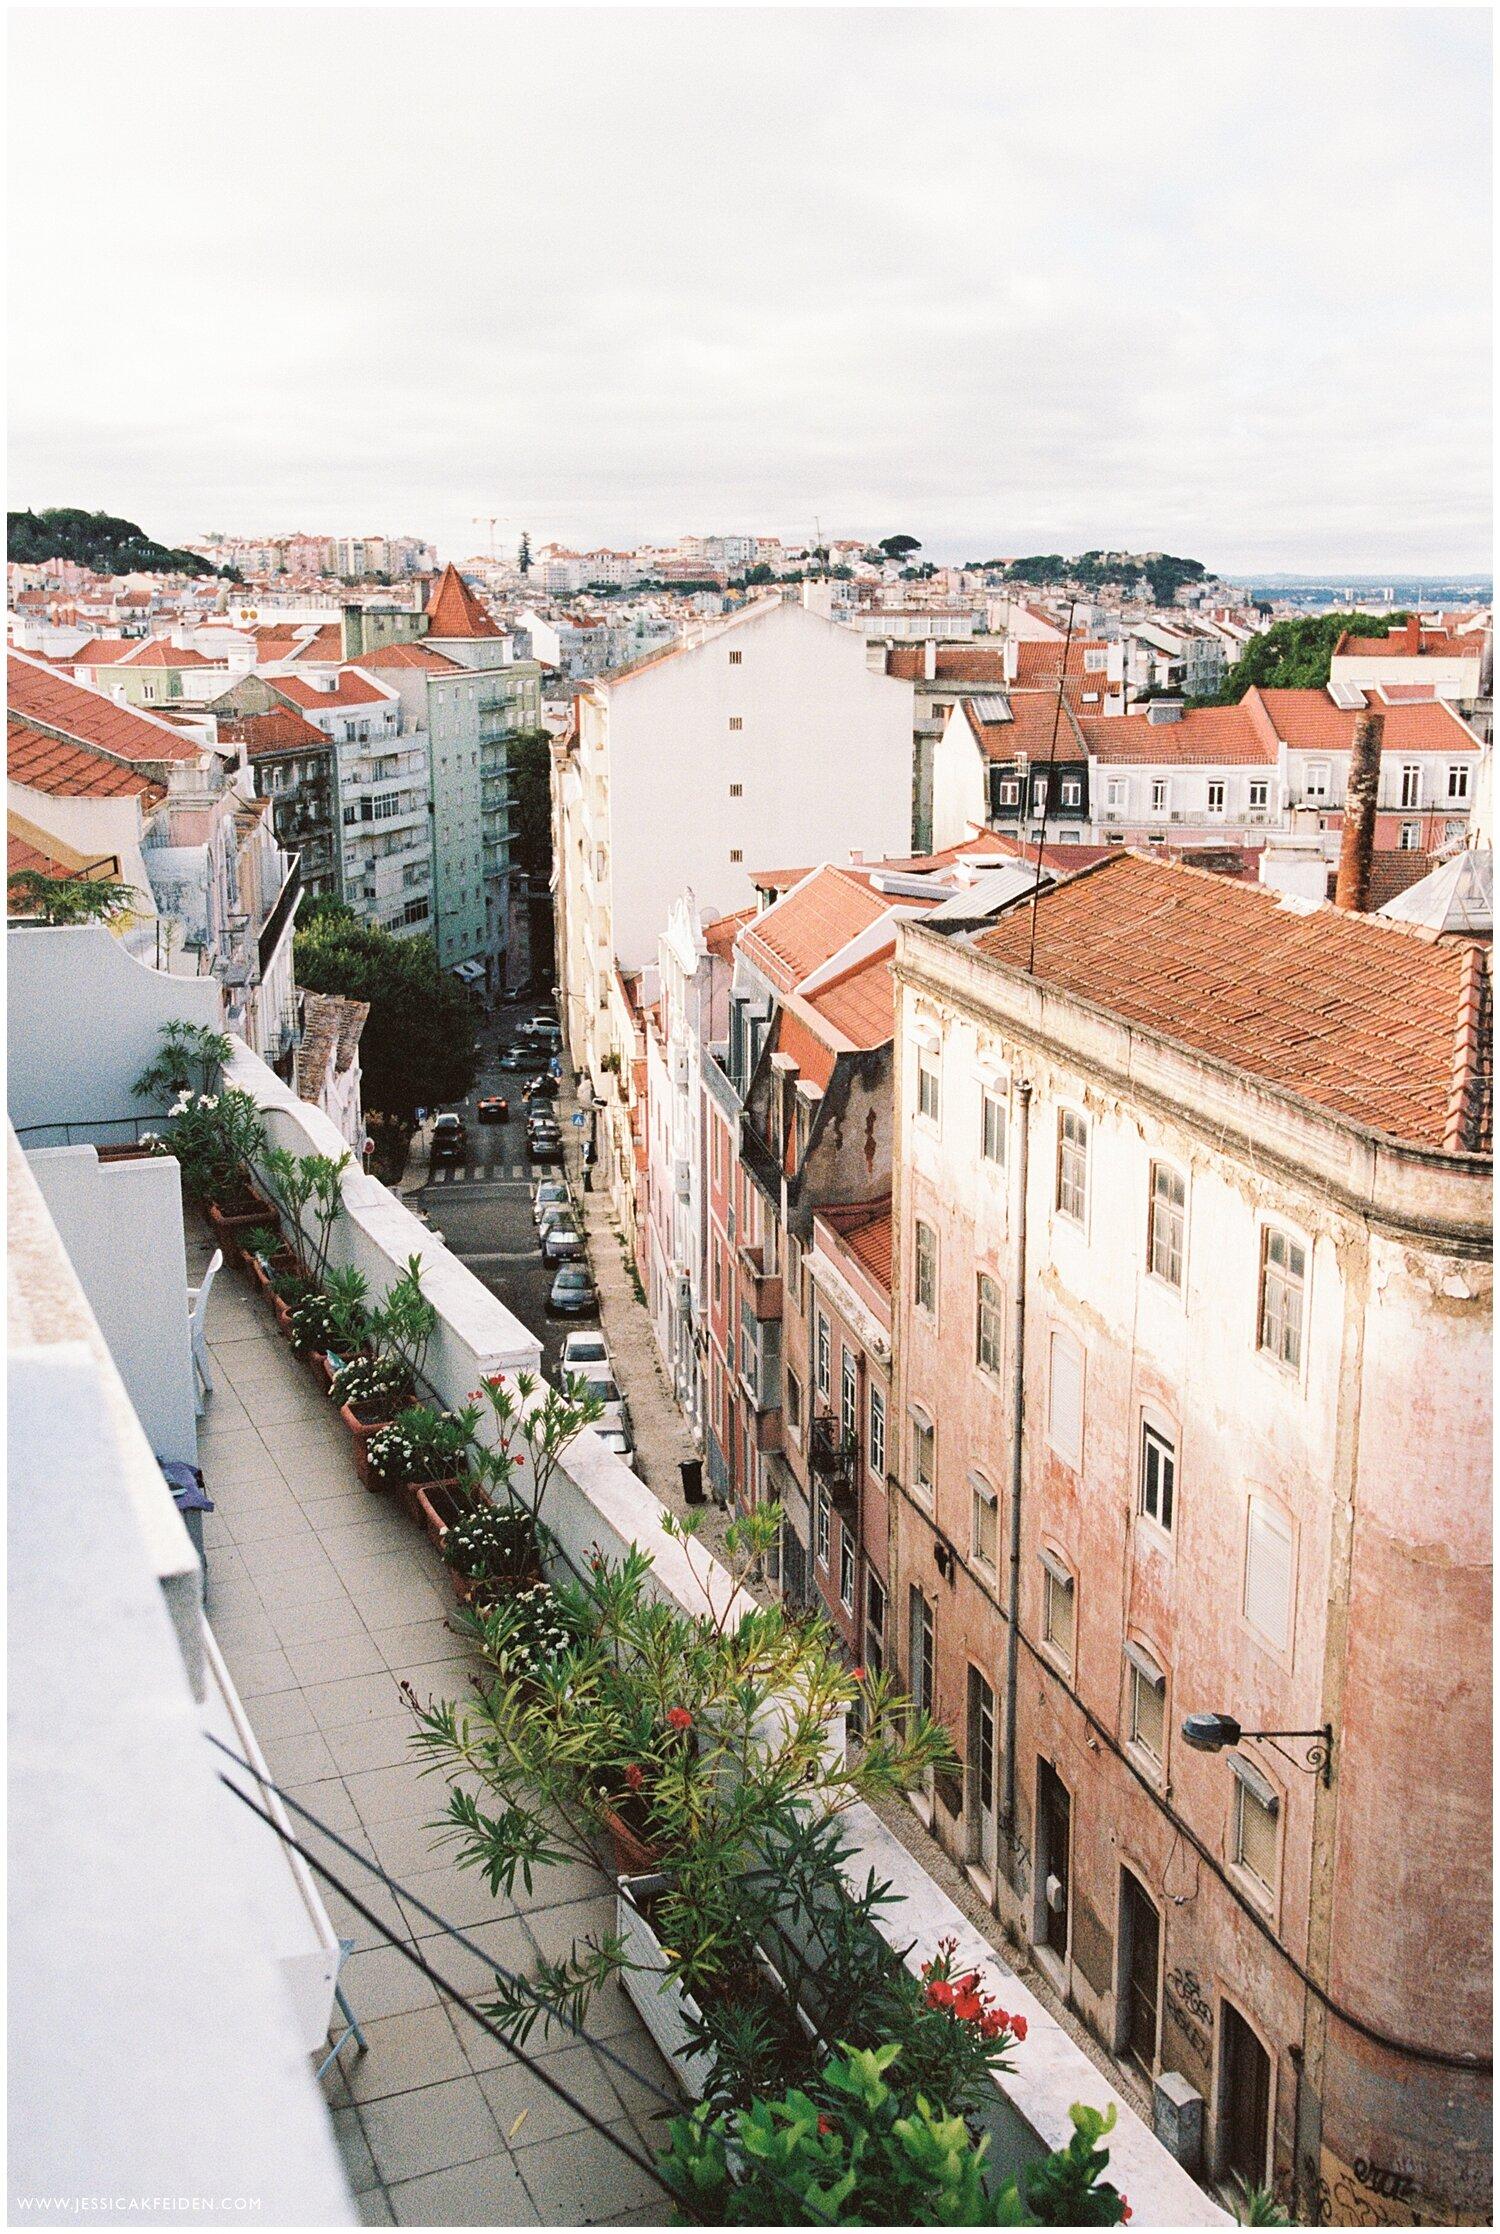 Jessica K Feiden Photography_Portugal Film Photographer_Portugal Travel Photographs_0032.jpg